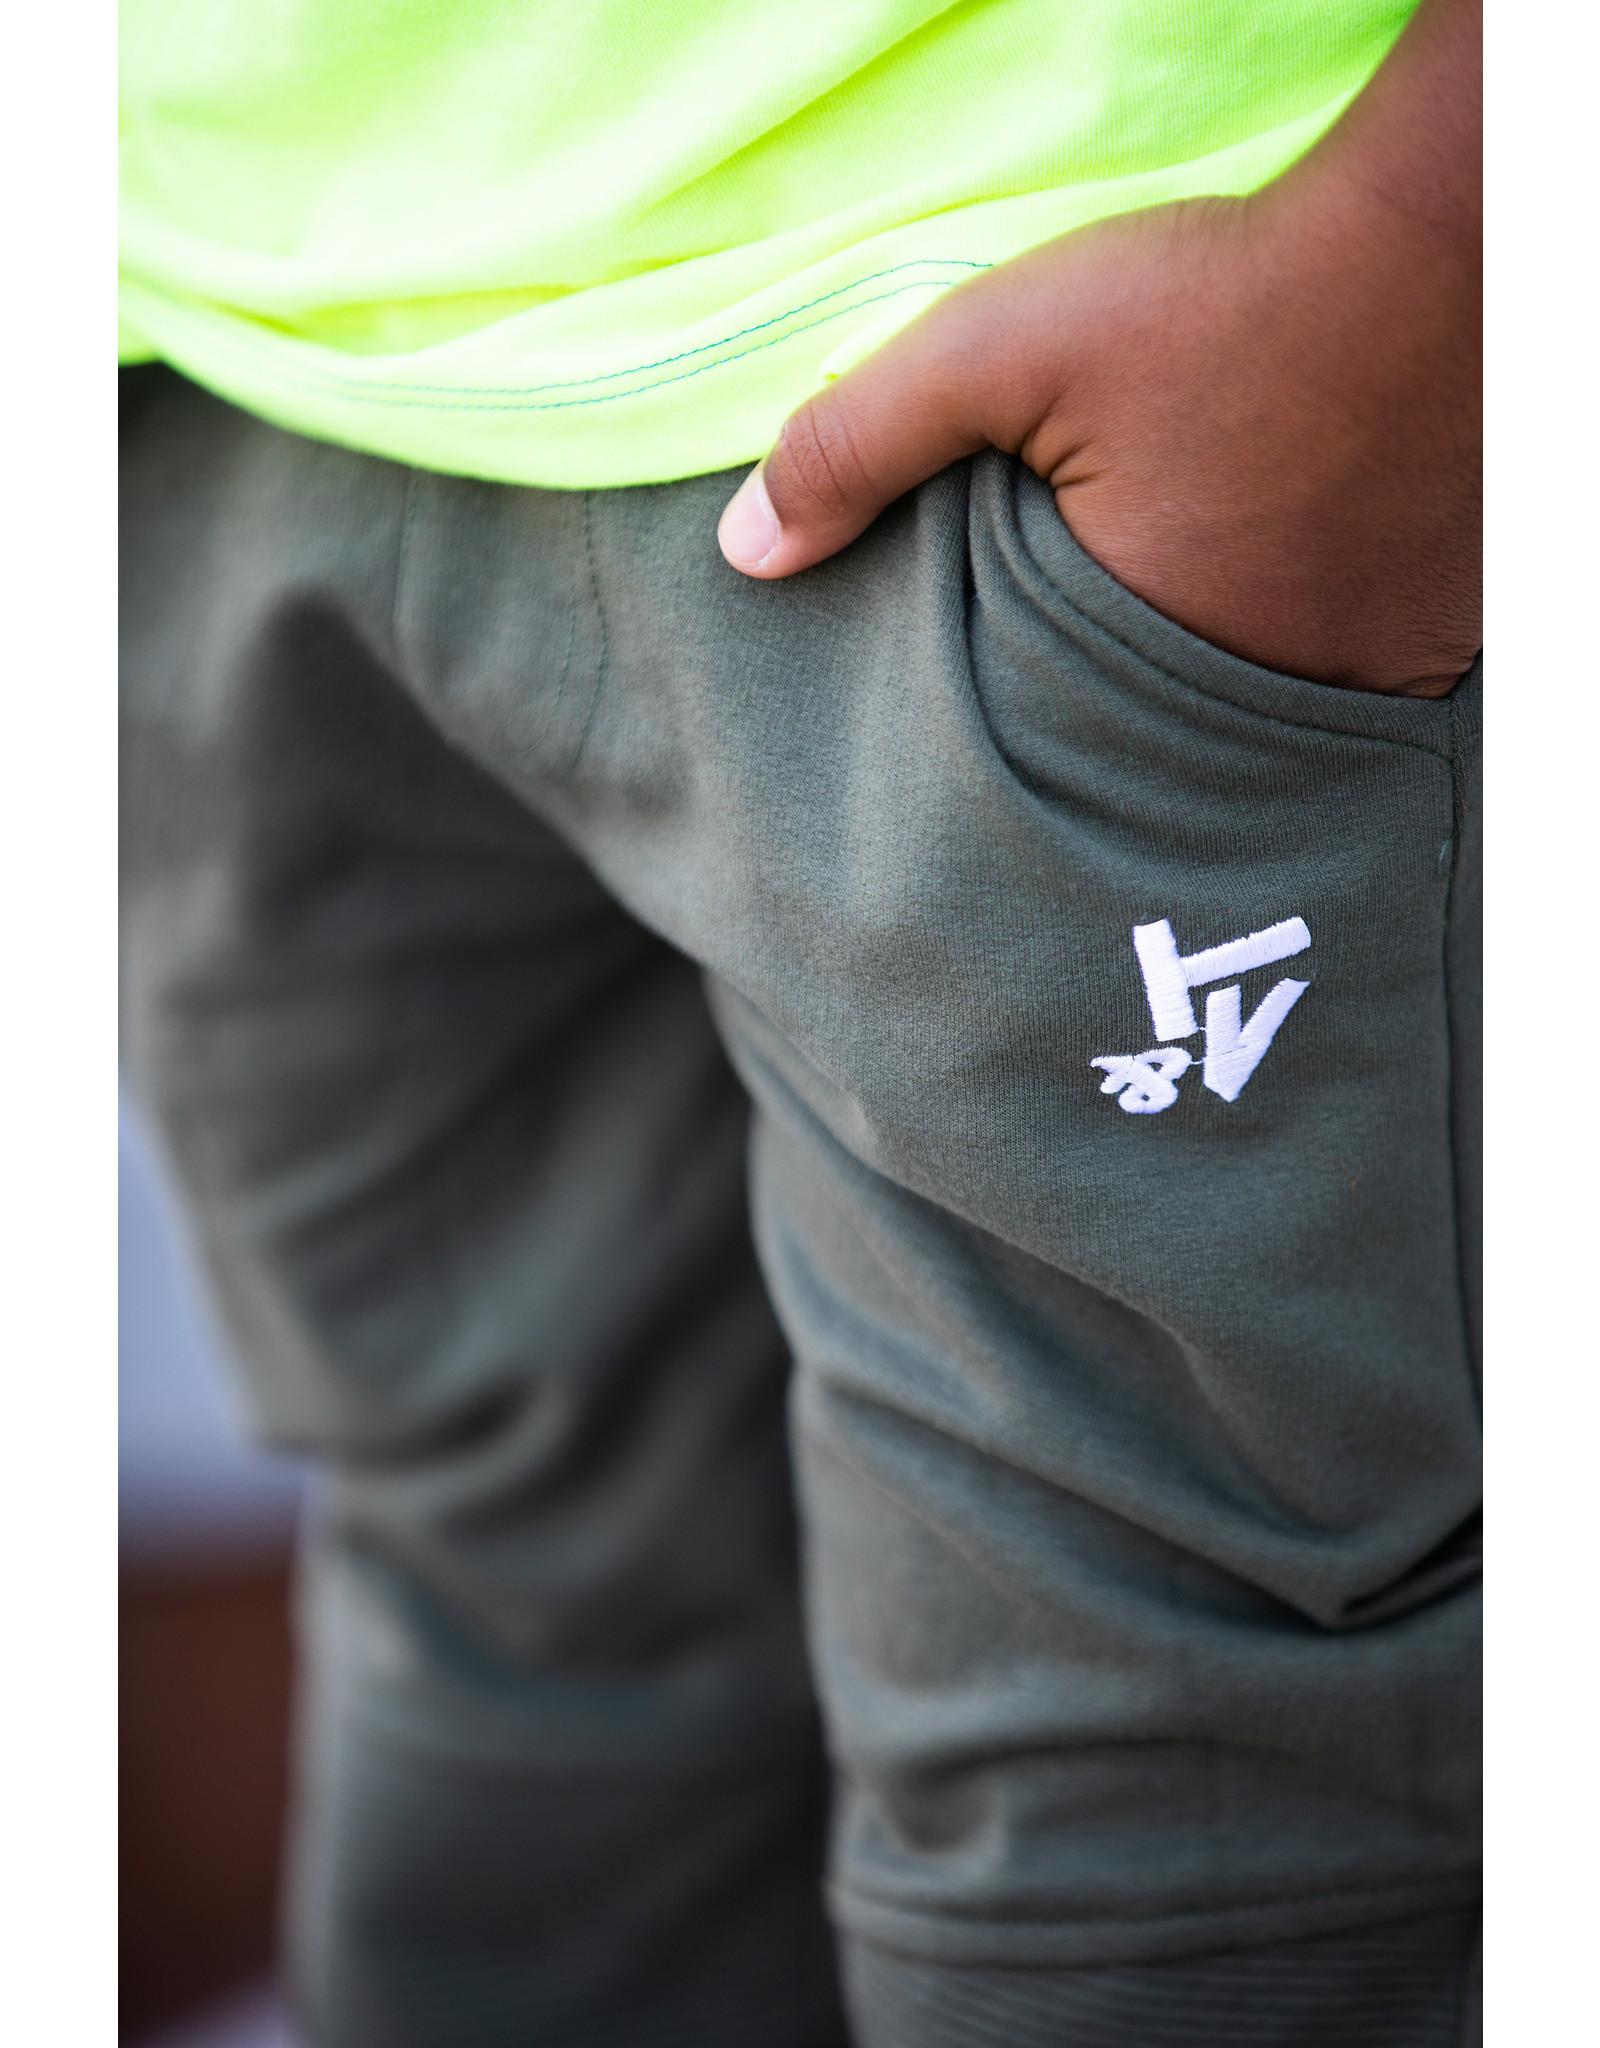 Tygo & Vito T&v jog pants kneepatch army